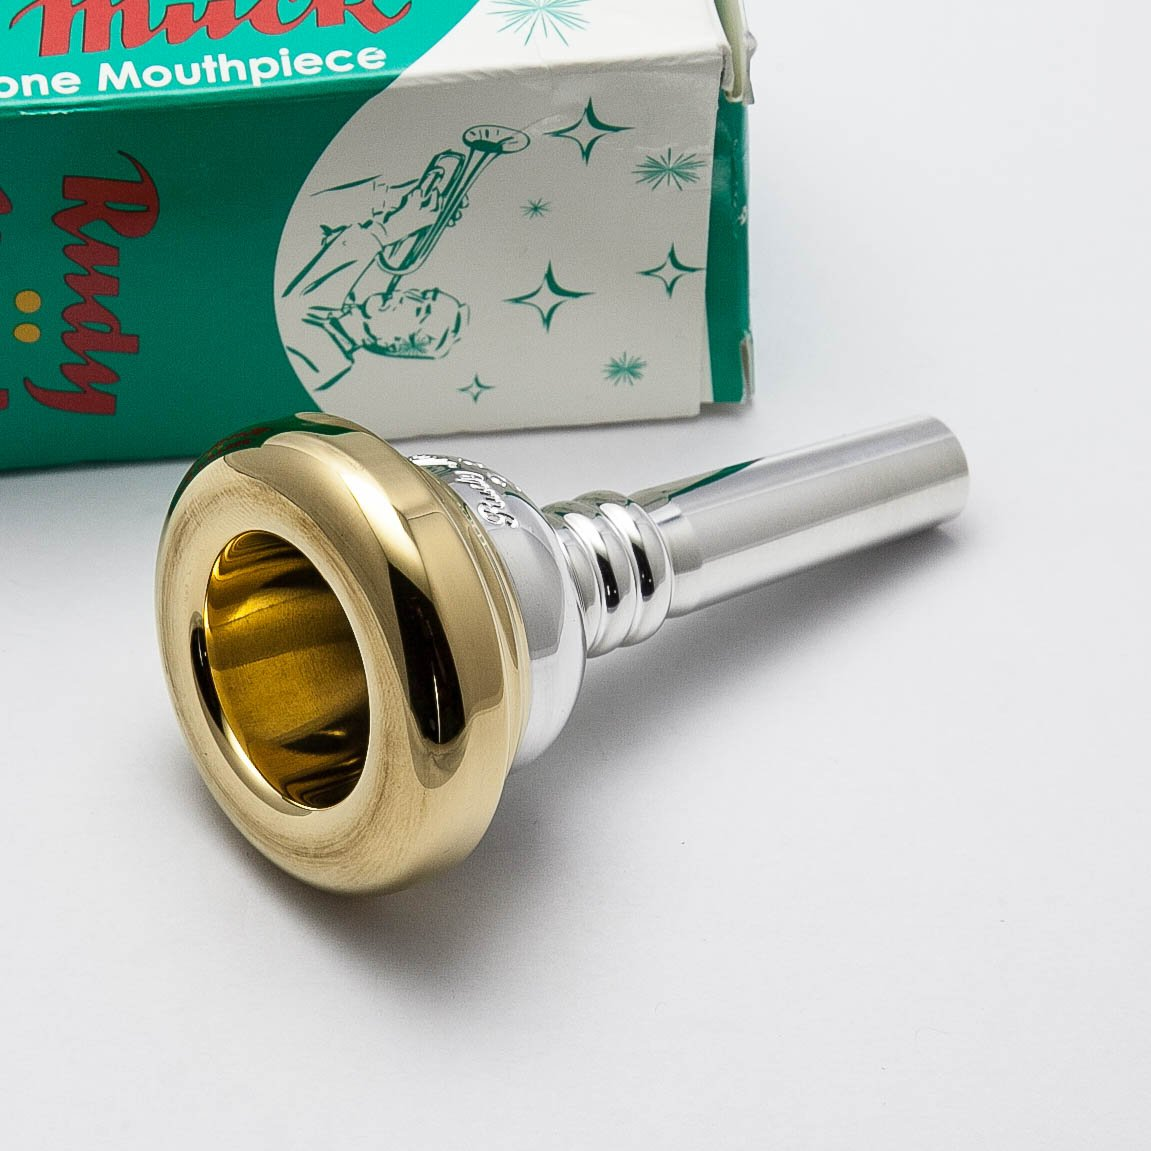 Rudy Muck 23 24K Gold Rim & Cup Small Shank Trombone Mouthpiece Conn-Selmer